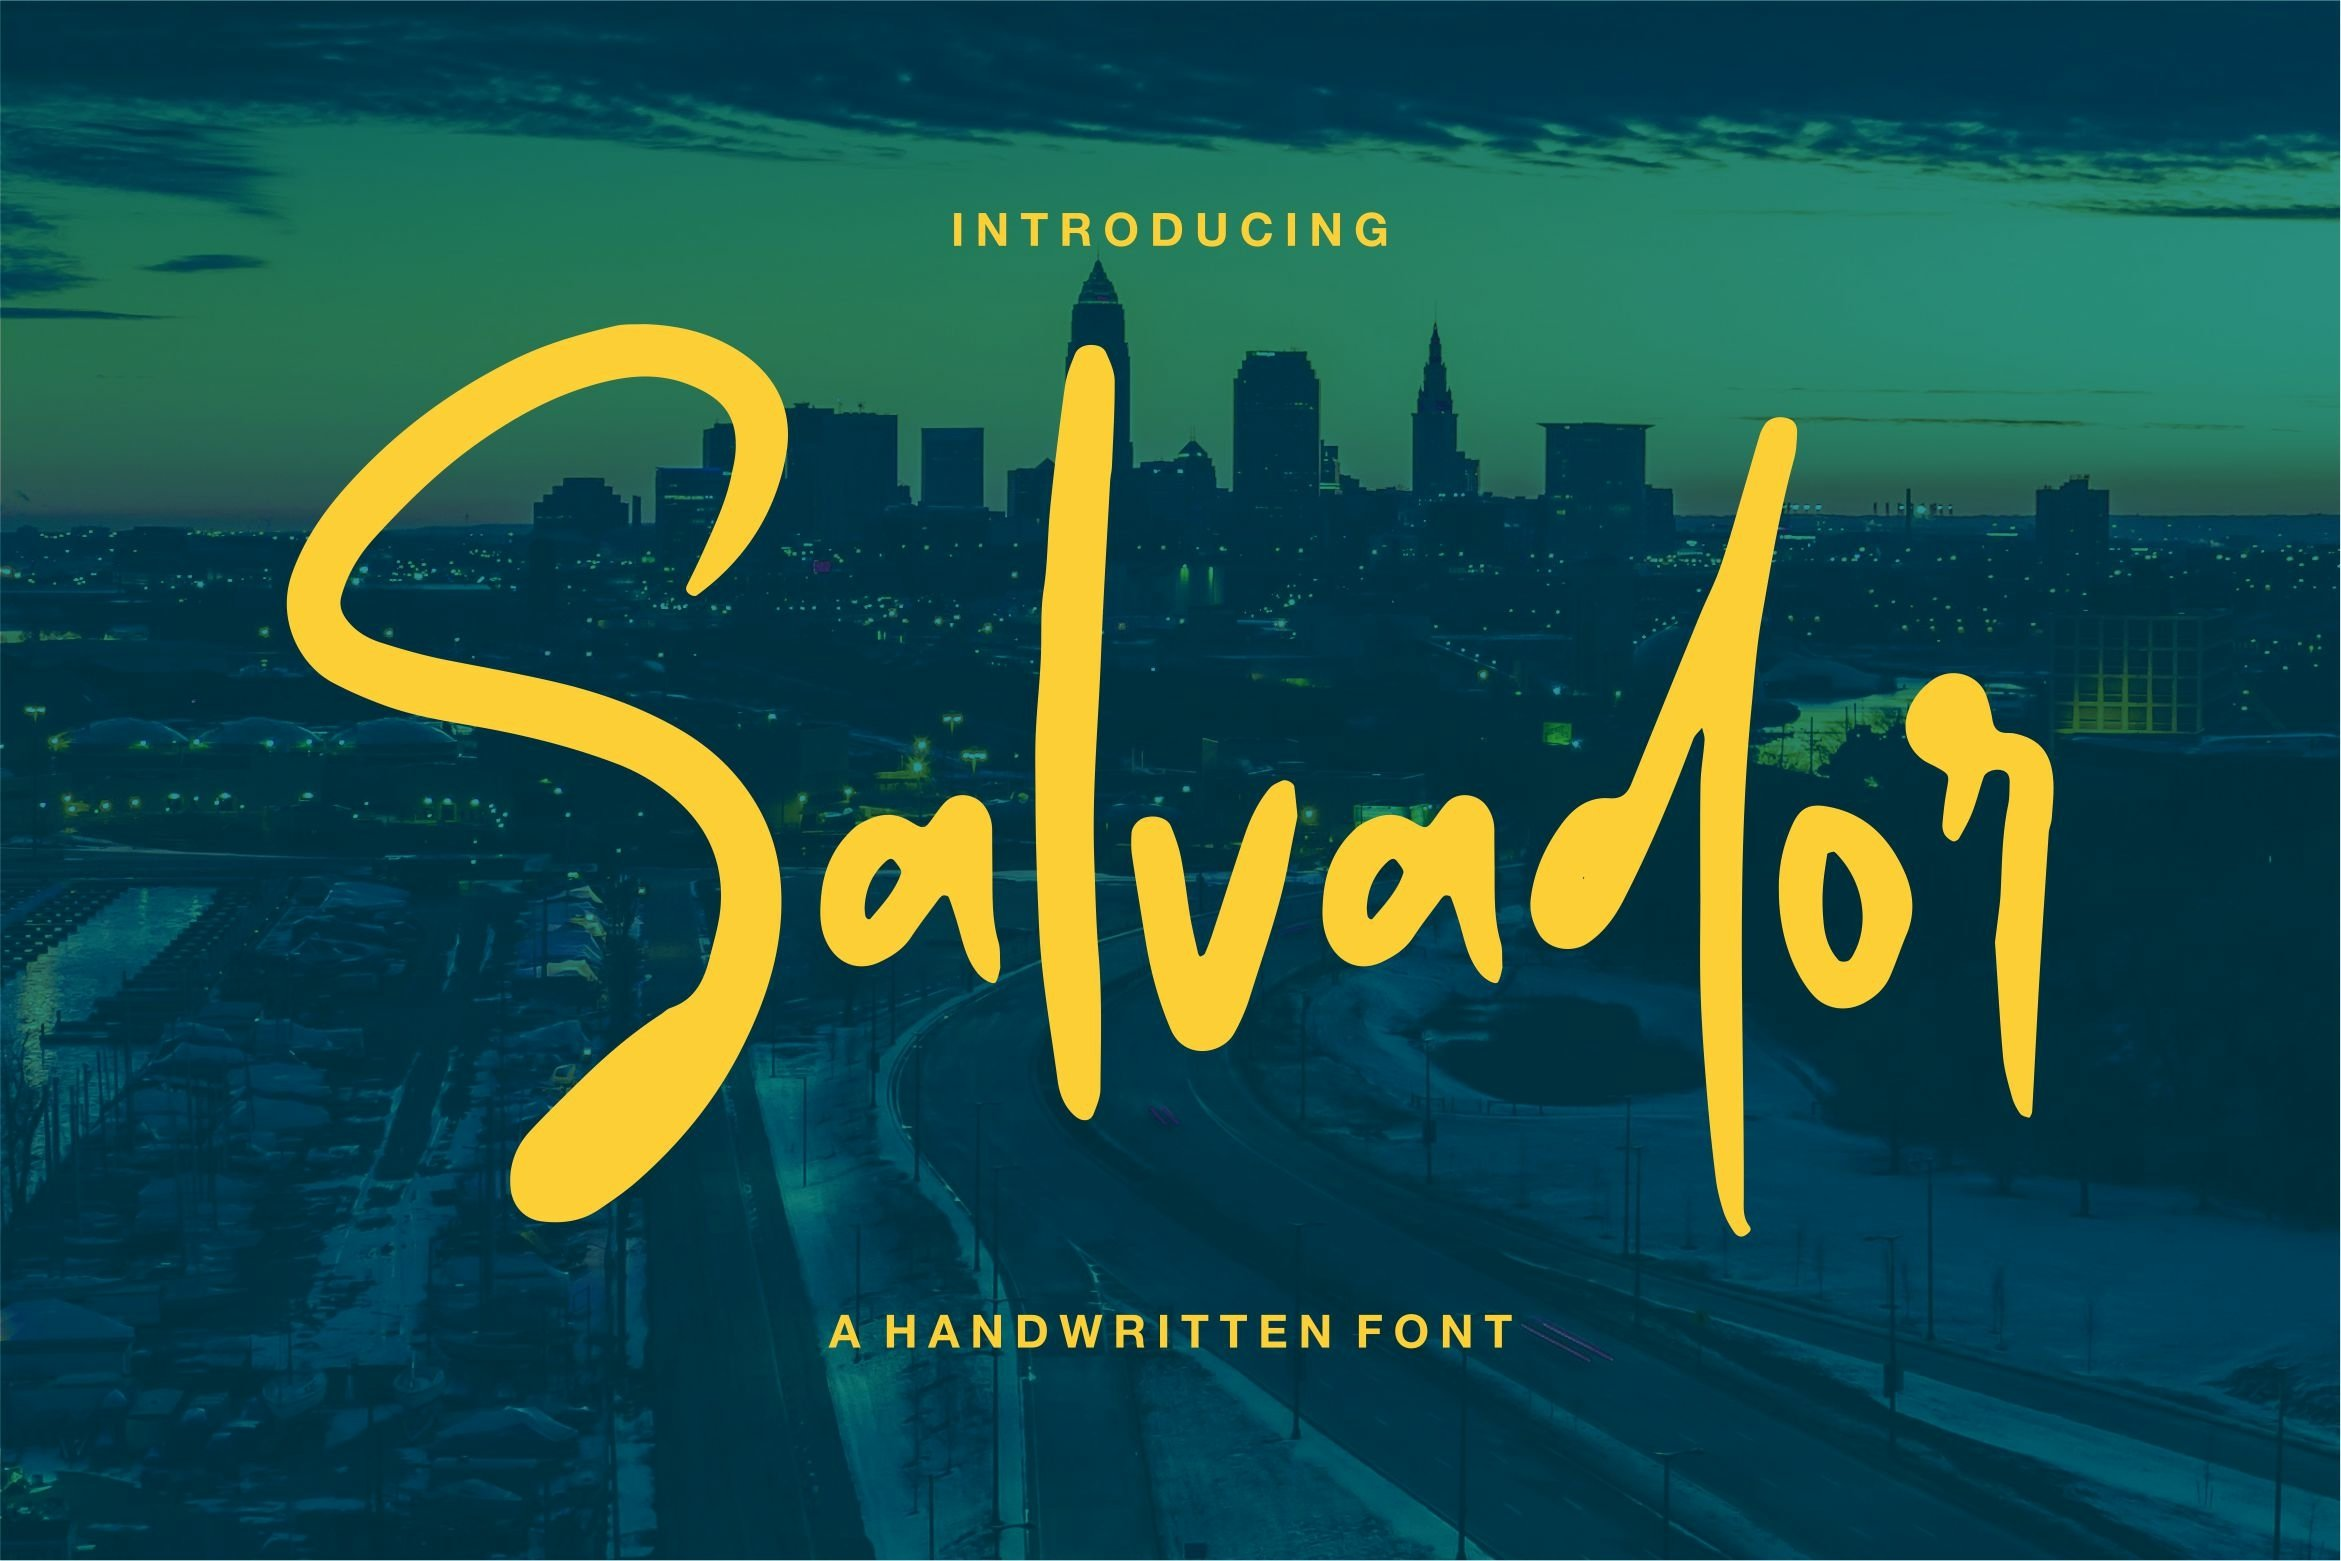 Salvador - A Handwritten Font example image 1